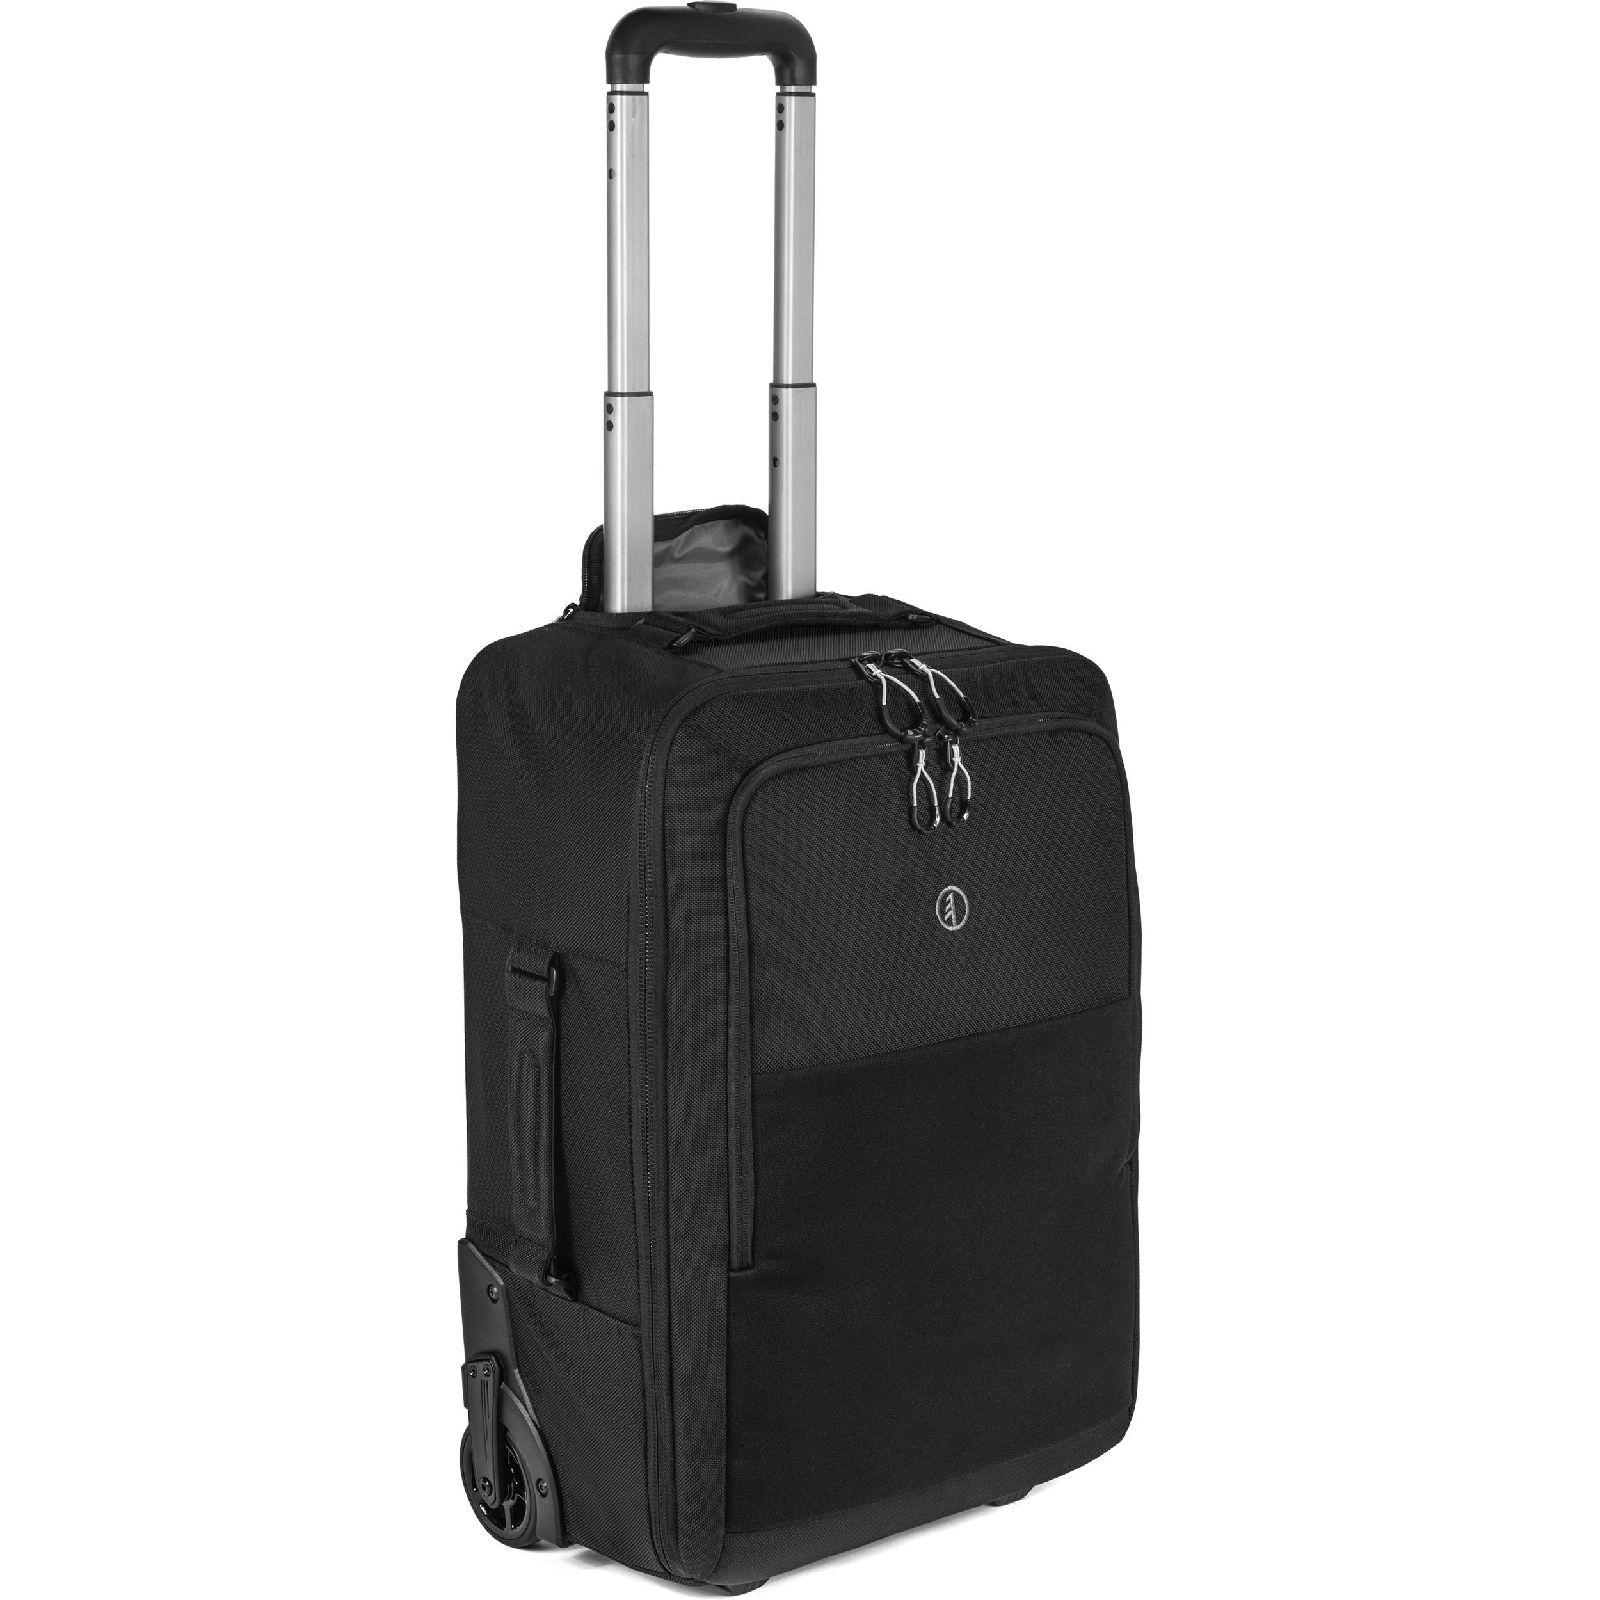 Tamrac SpeedRoller International Trolley Black Wheeled Gear Bag kufer za foto opremu kofer s rotama (T2510-1919)